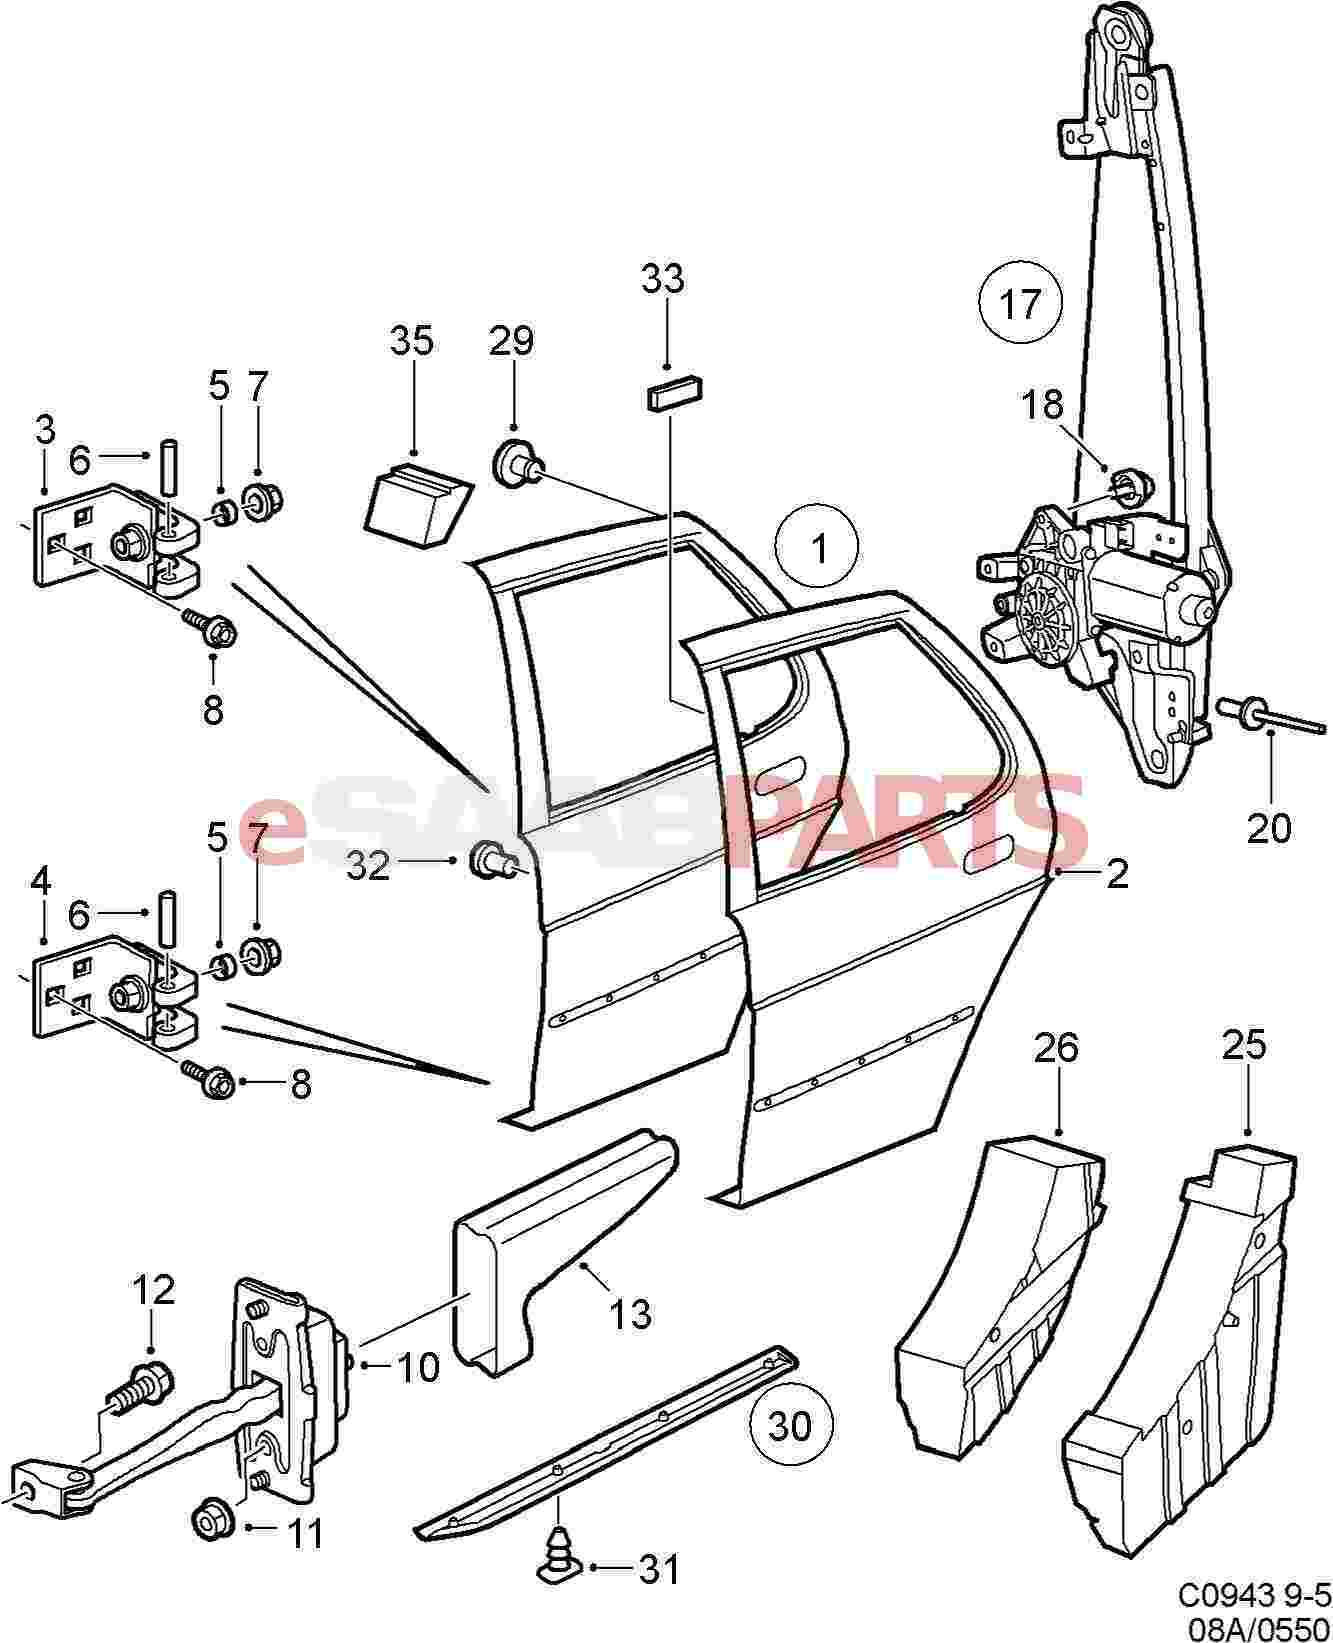 Door Parts Car Amp Datsun Z Car Parts Diagrams